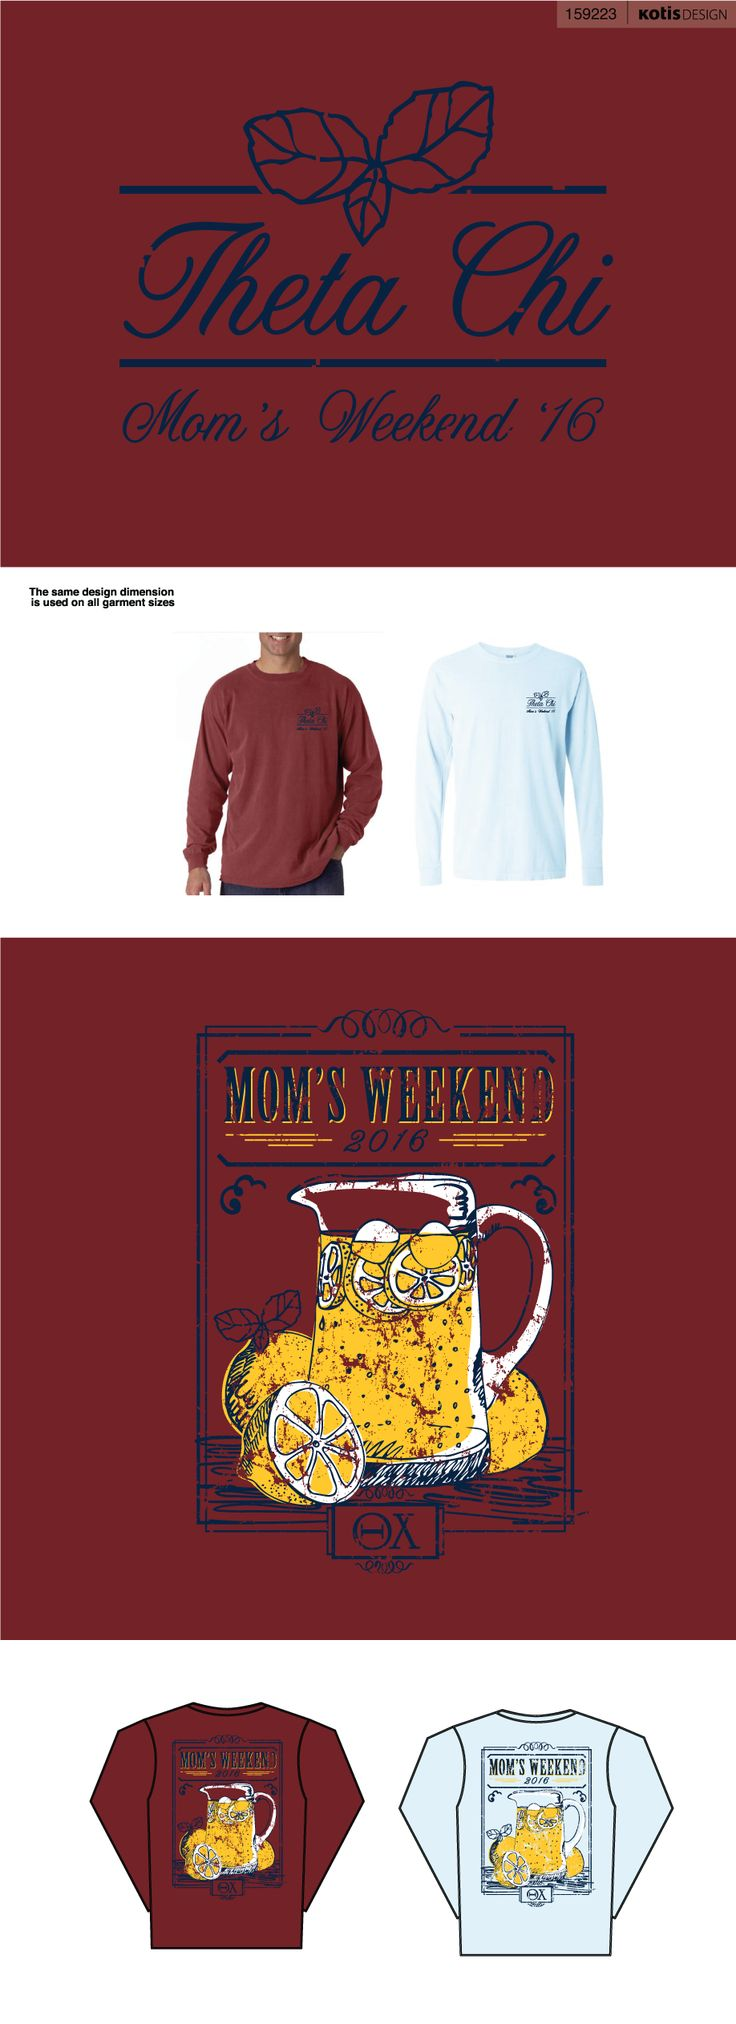 159223 - UM at Ohio Theta Chi | Mom's Weekend '16 - View Proof - Kotis Design